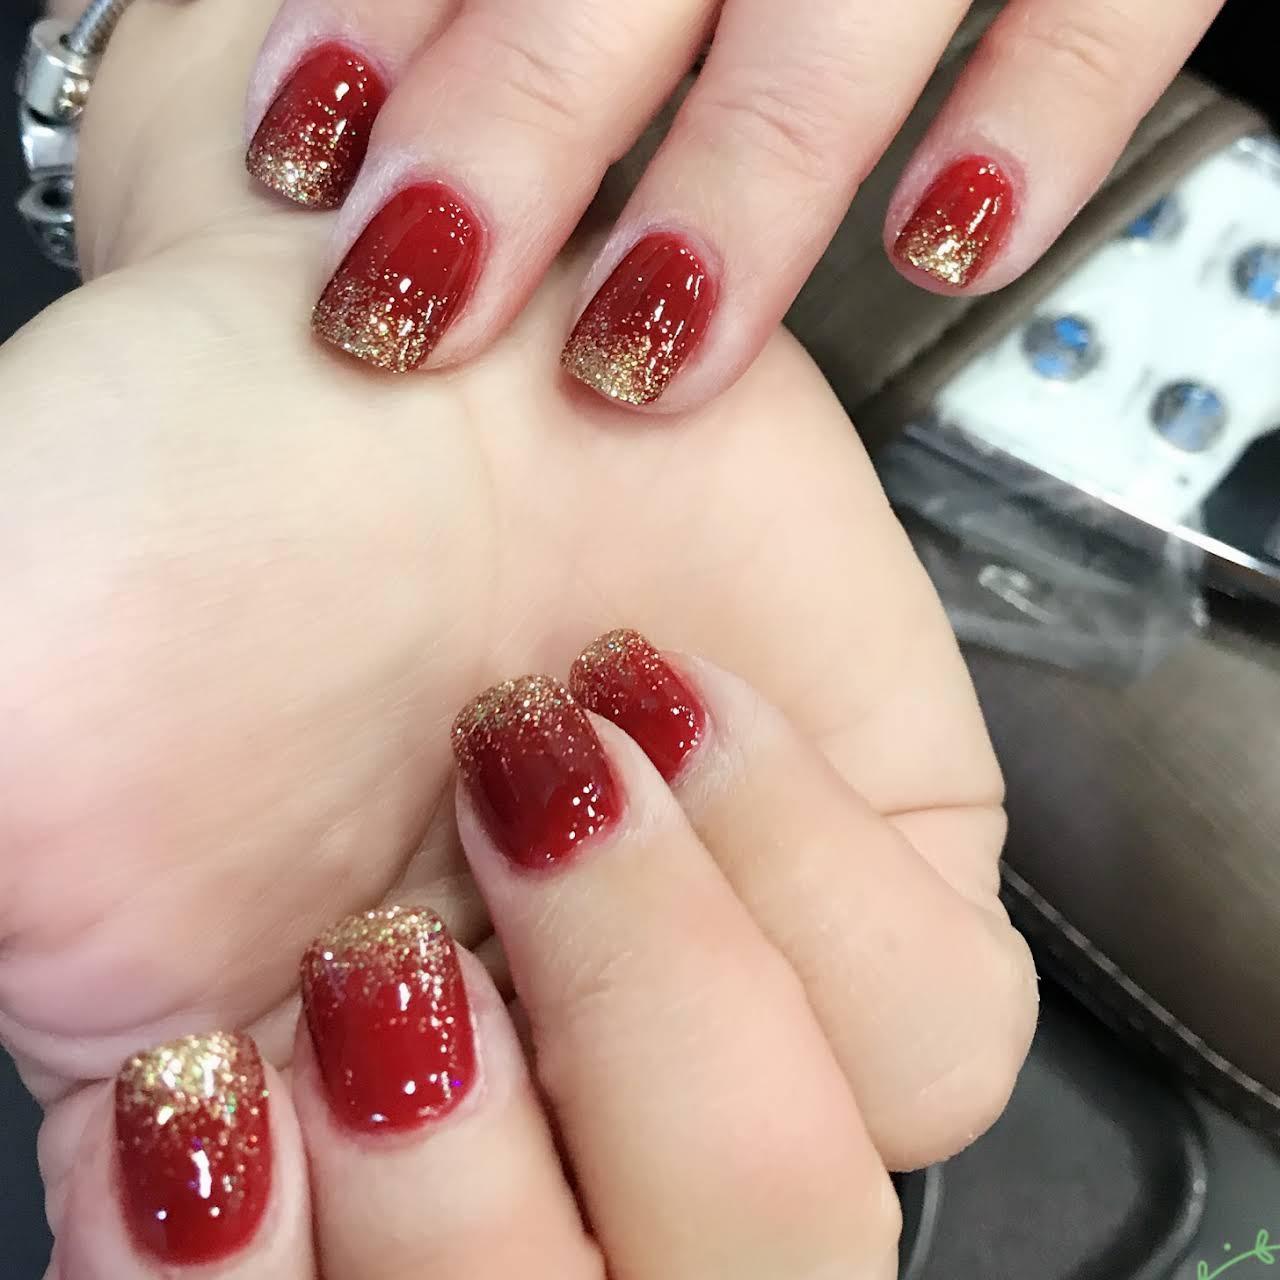 Organic Nails - Nail Salon in Shawnee